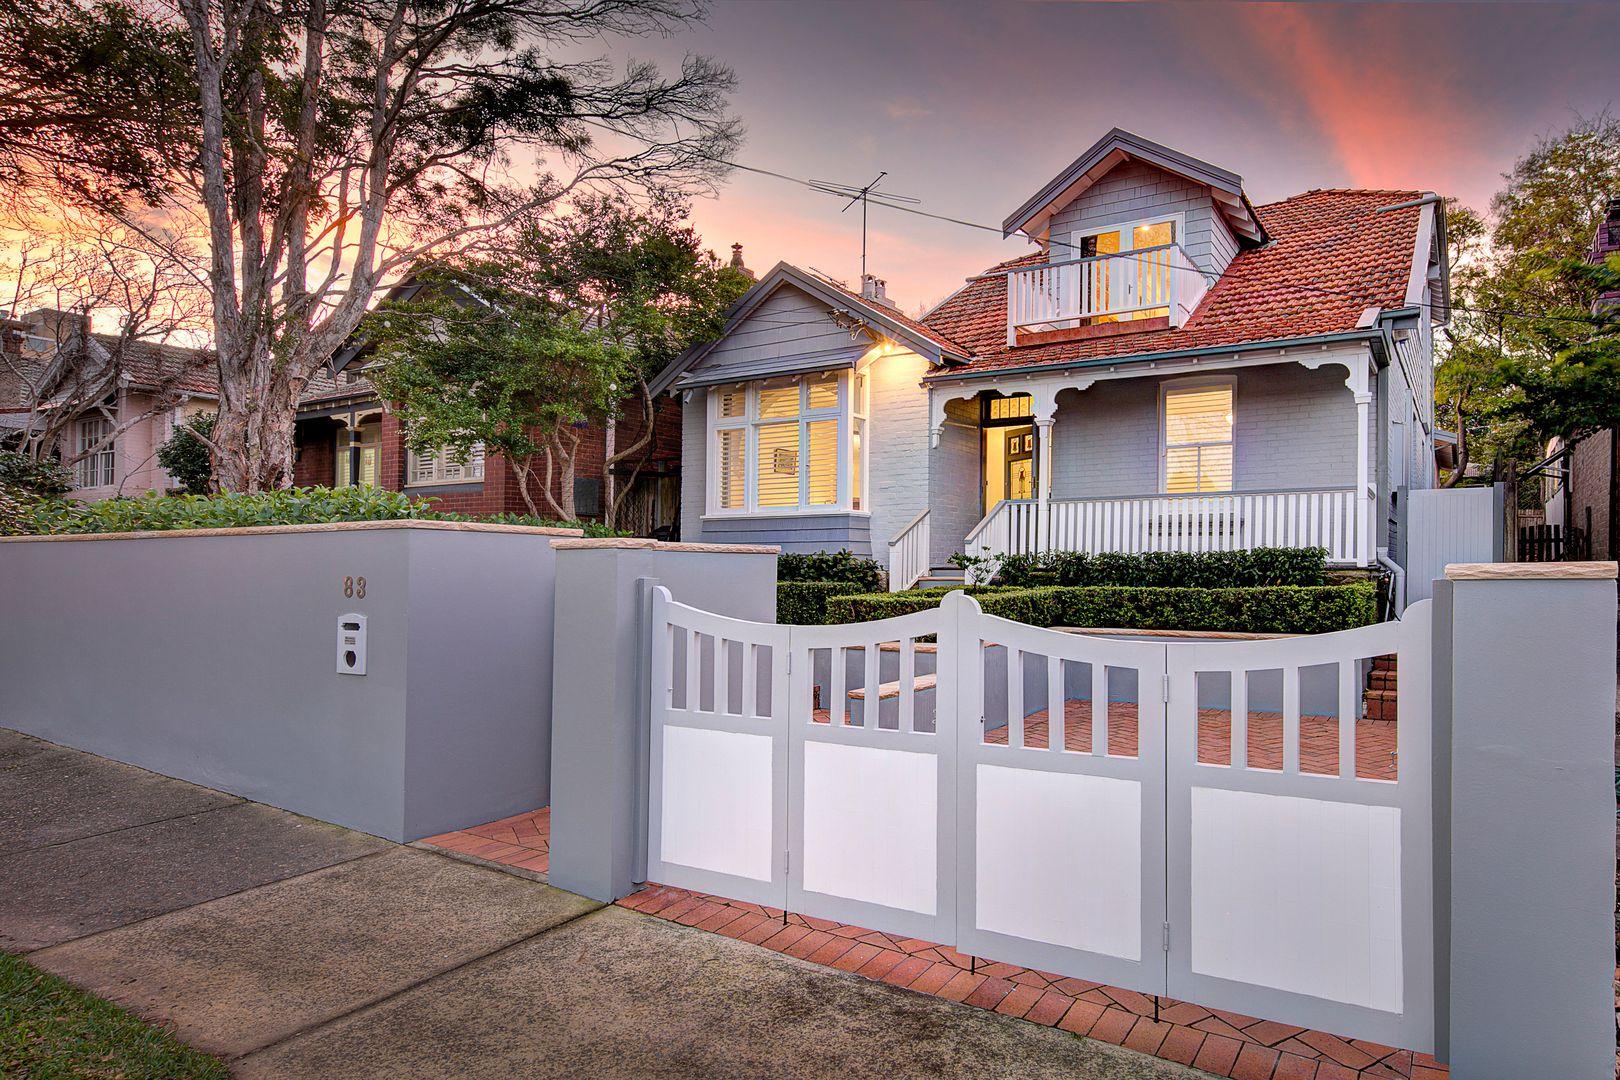 83 Holt  Avenue, Mosman NSW 2088, Image 0